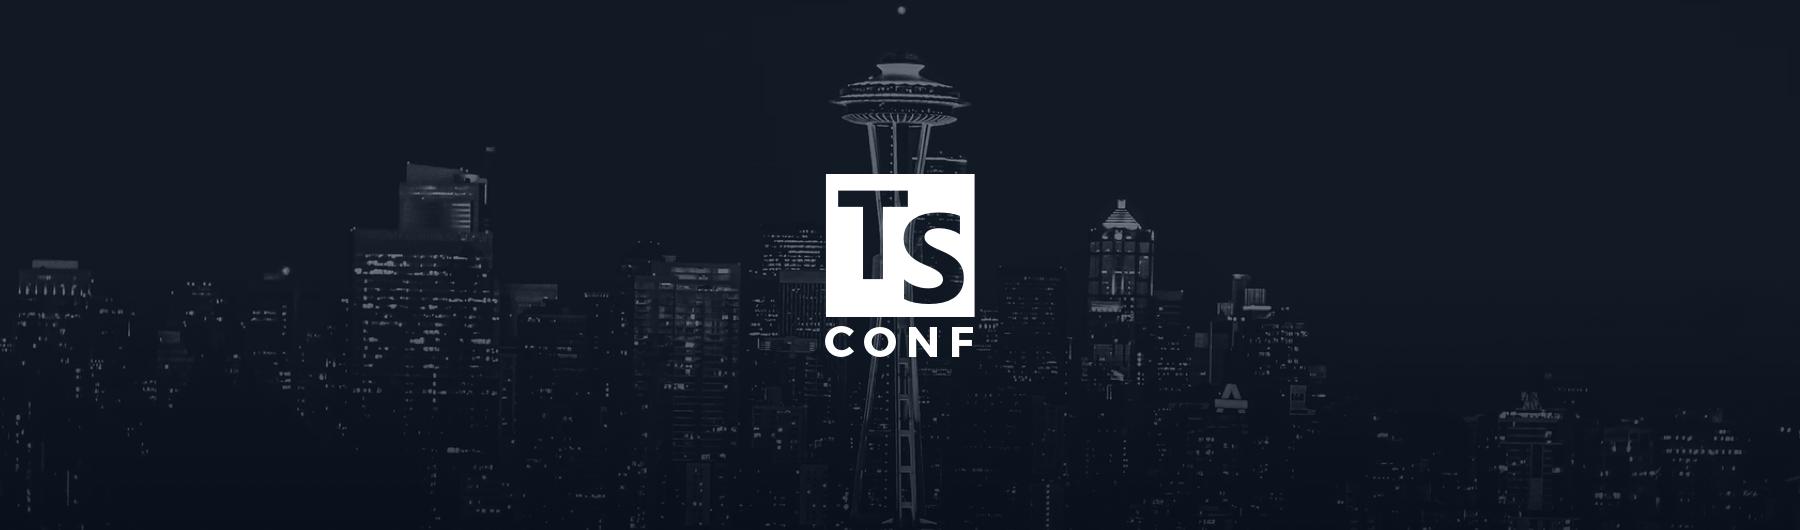 TSConf 2019